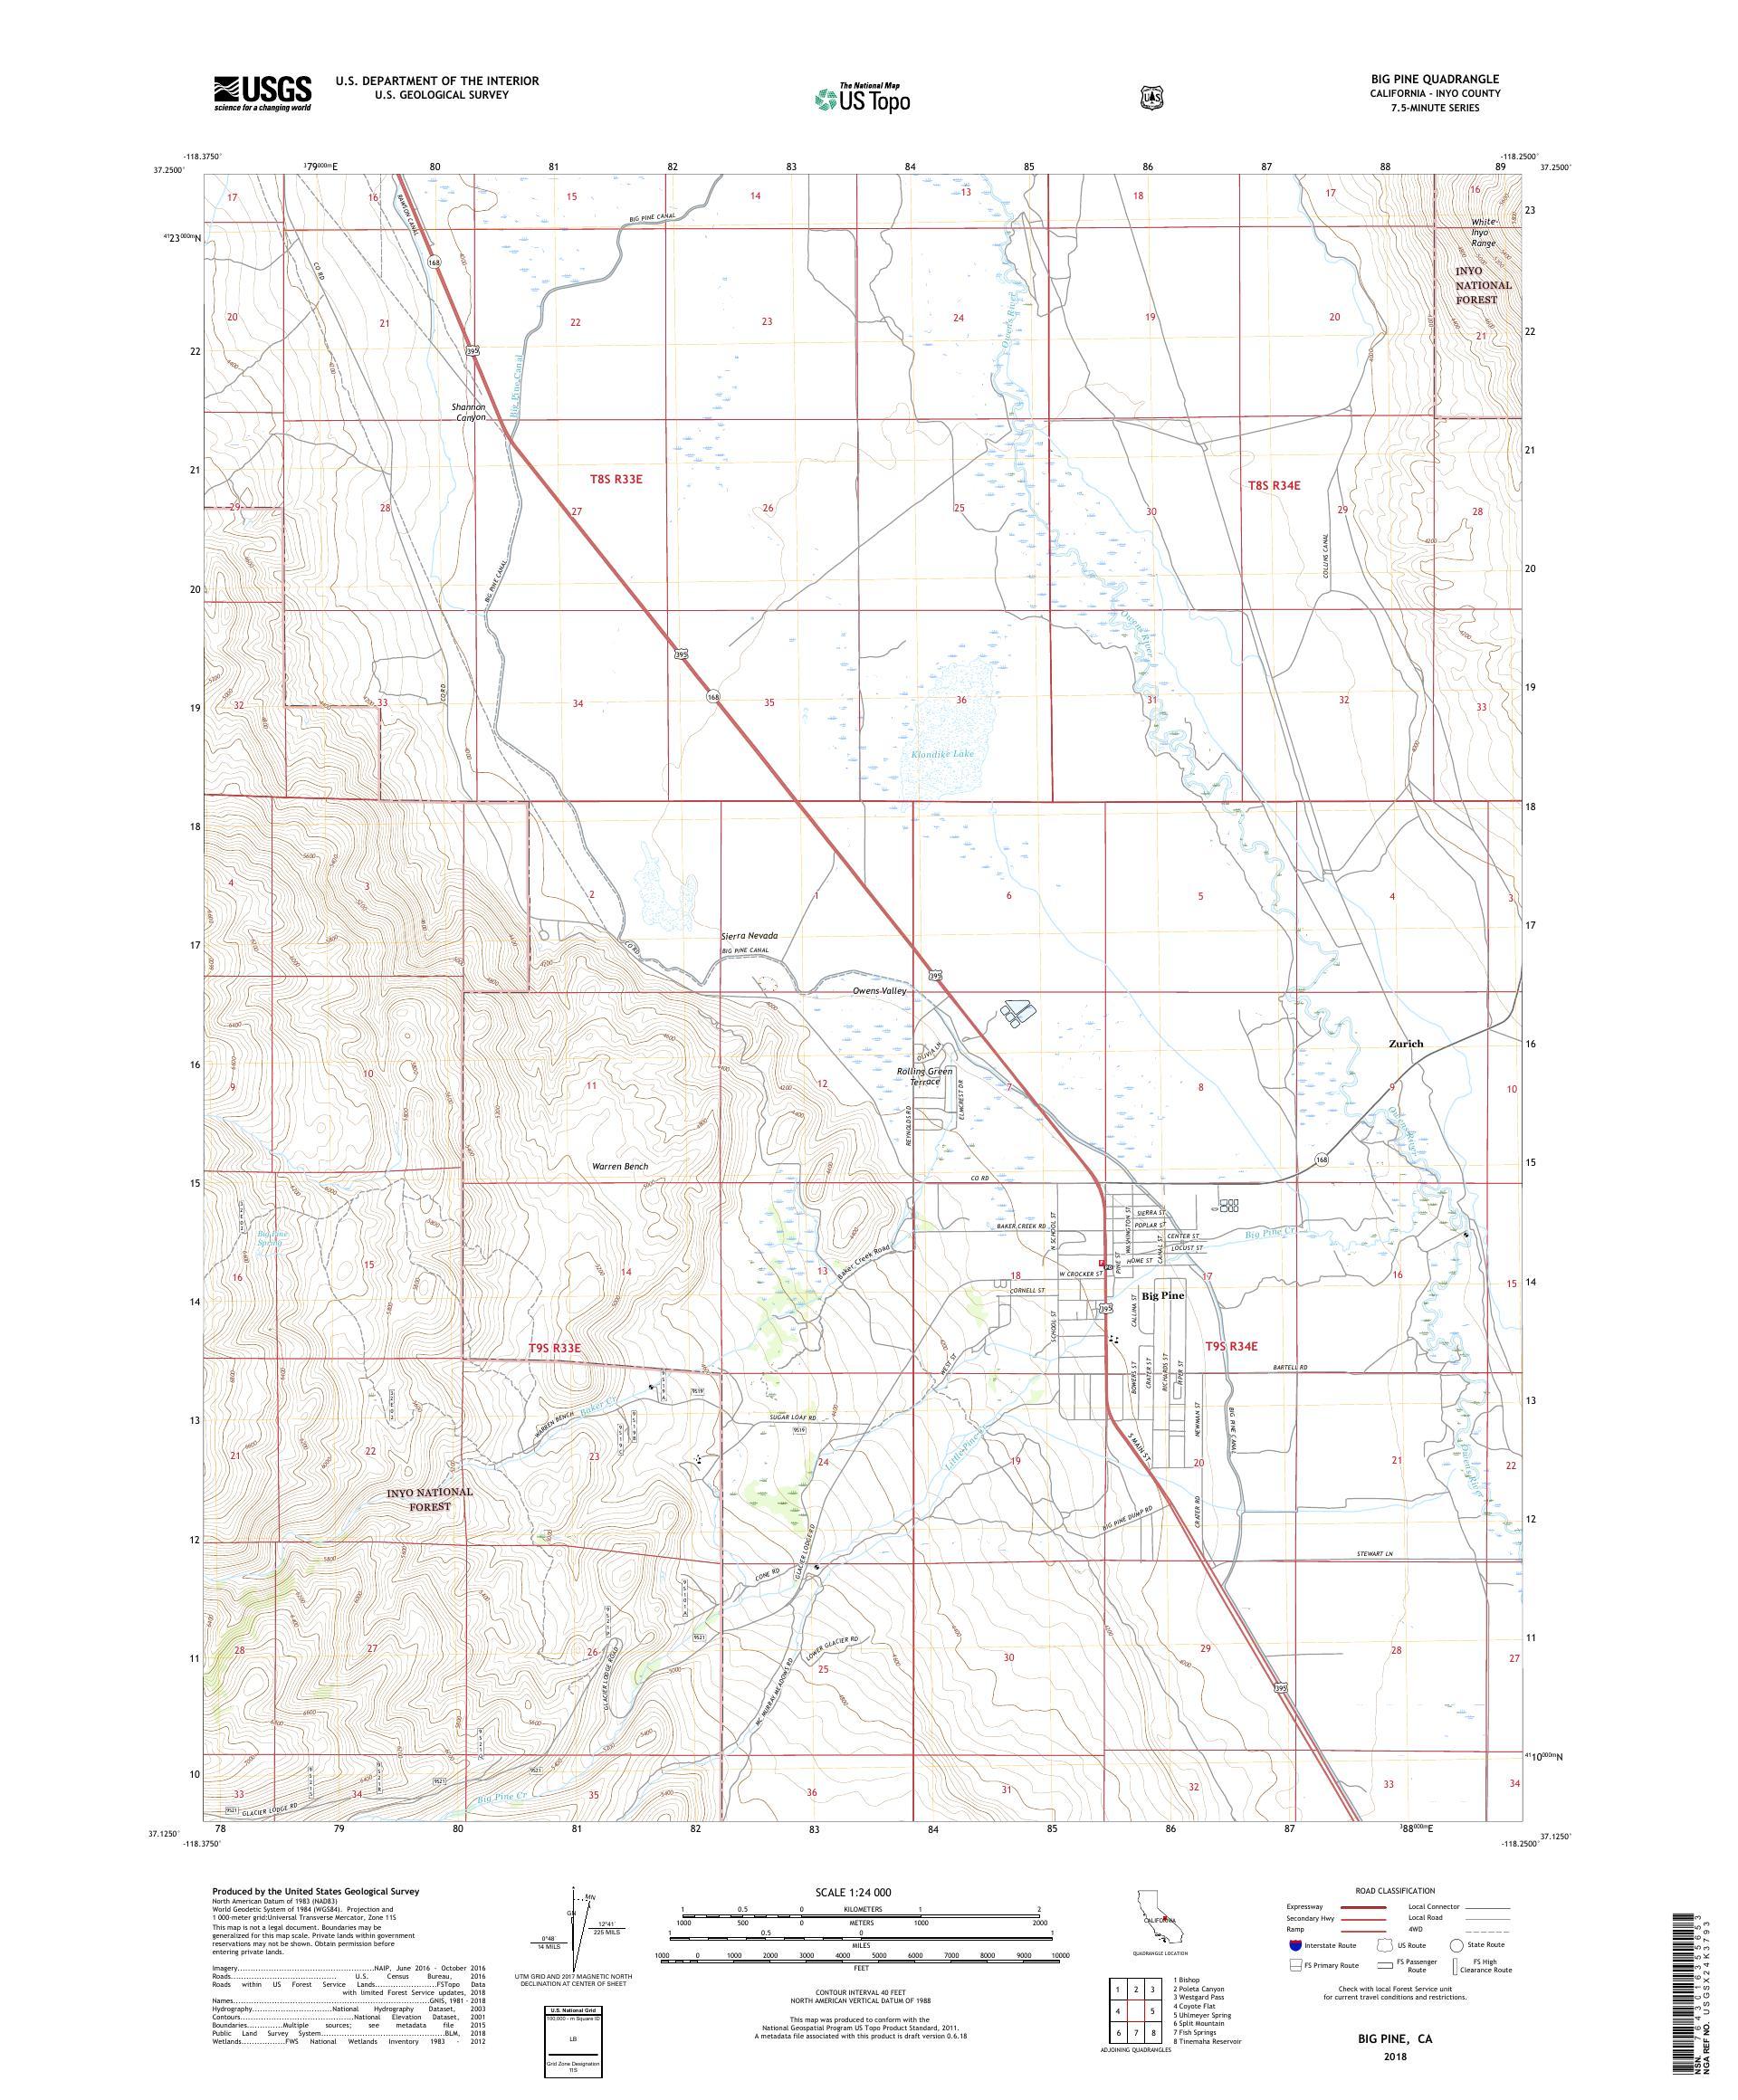 MyTopo Big Pine, California USGS Quad Topo Map